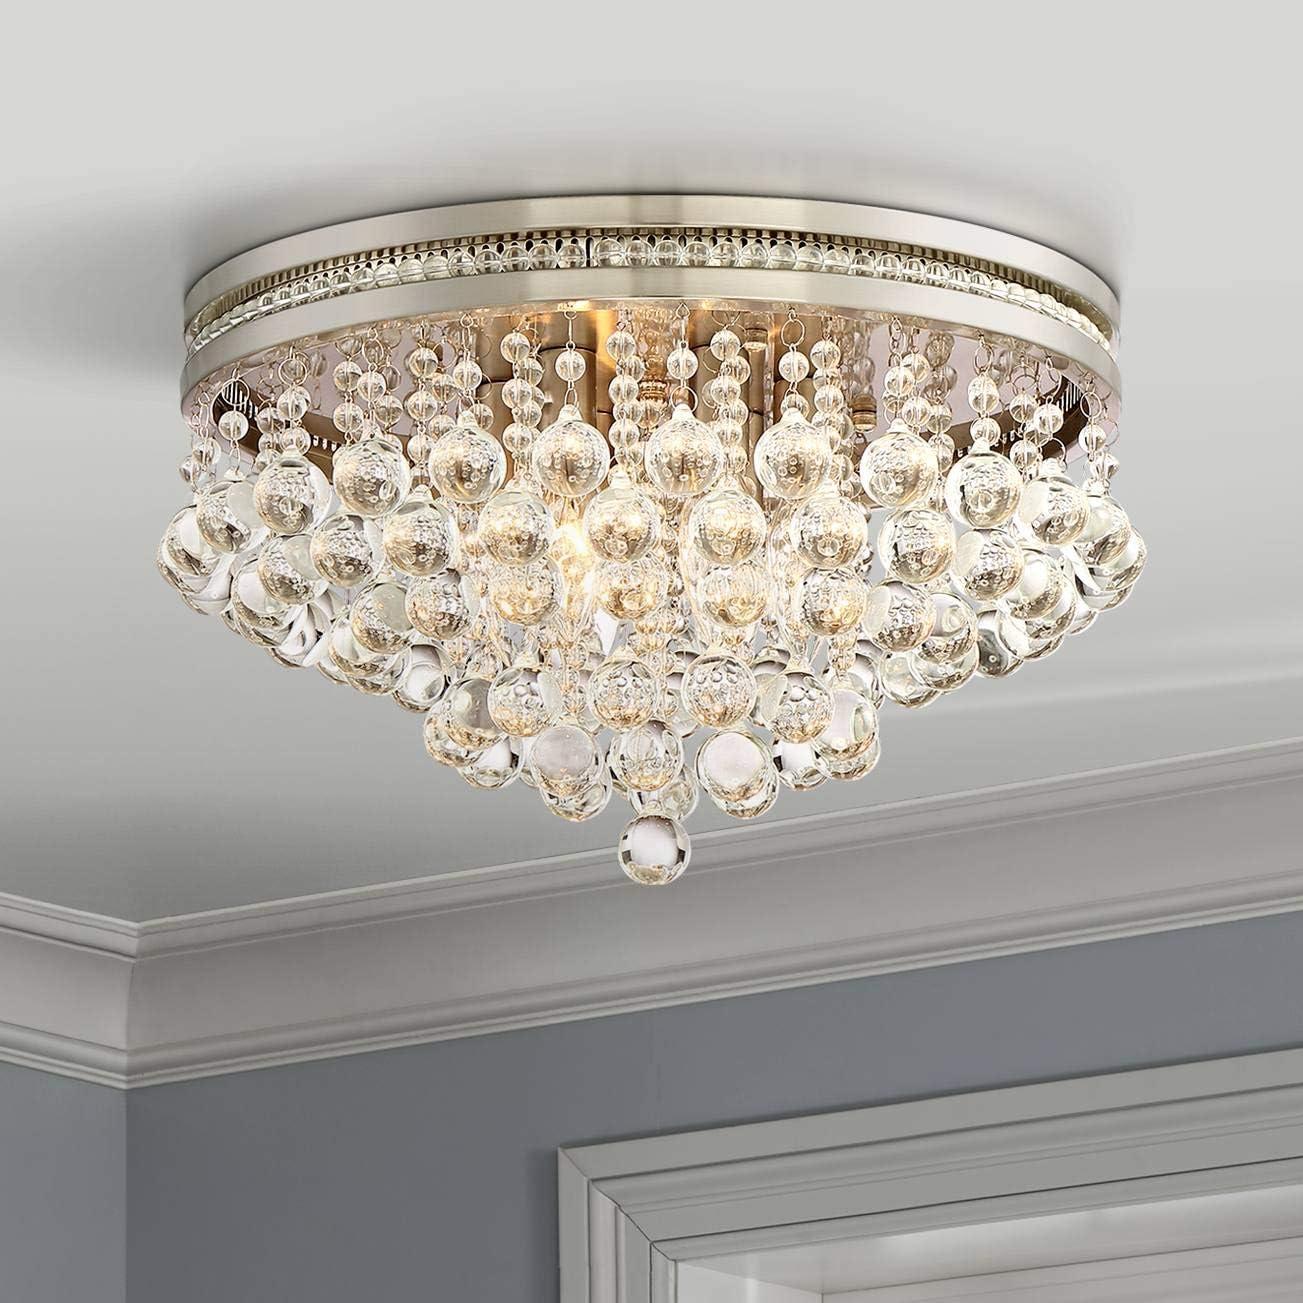 Regina Modern Ceiling Light Flush Mount Fixture Brushed Nickel 15 1 4 Wide Crystal Droplets For Bedroom Kitchen Living Room Hallway Bathroom Vienna Full Spectrum